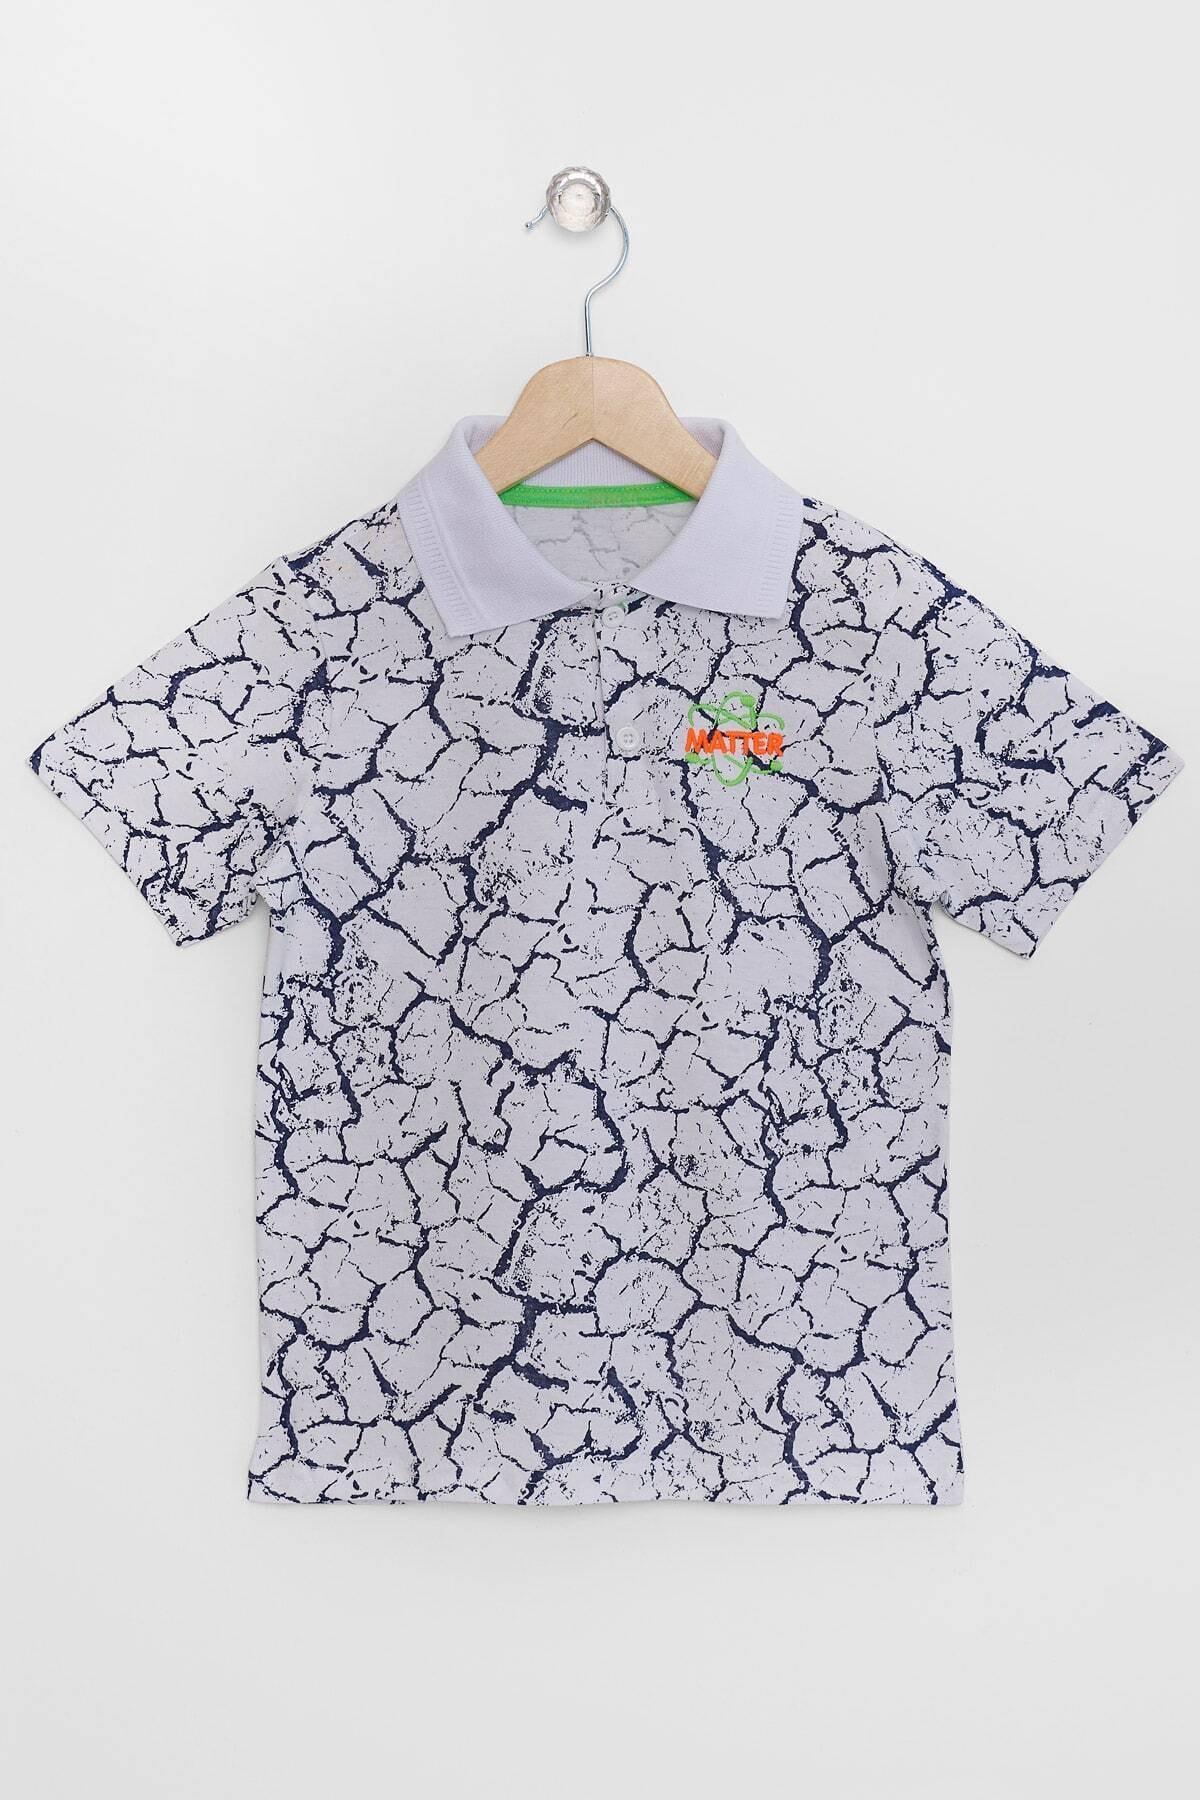 Erkek Çocuk Beyaz Polo Yaka T-shirt Matter Nakışlı 3-12 Yaş